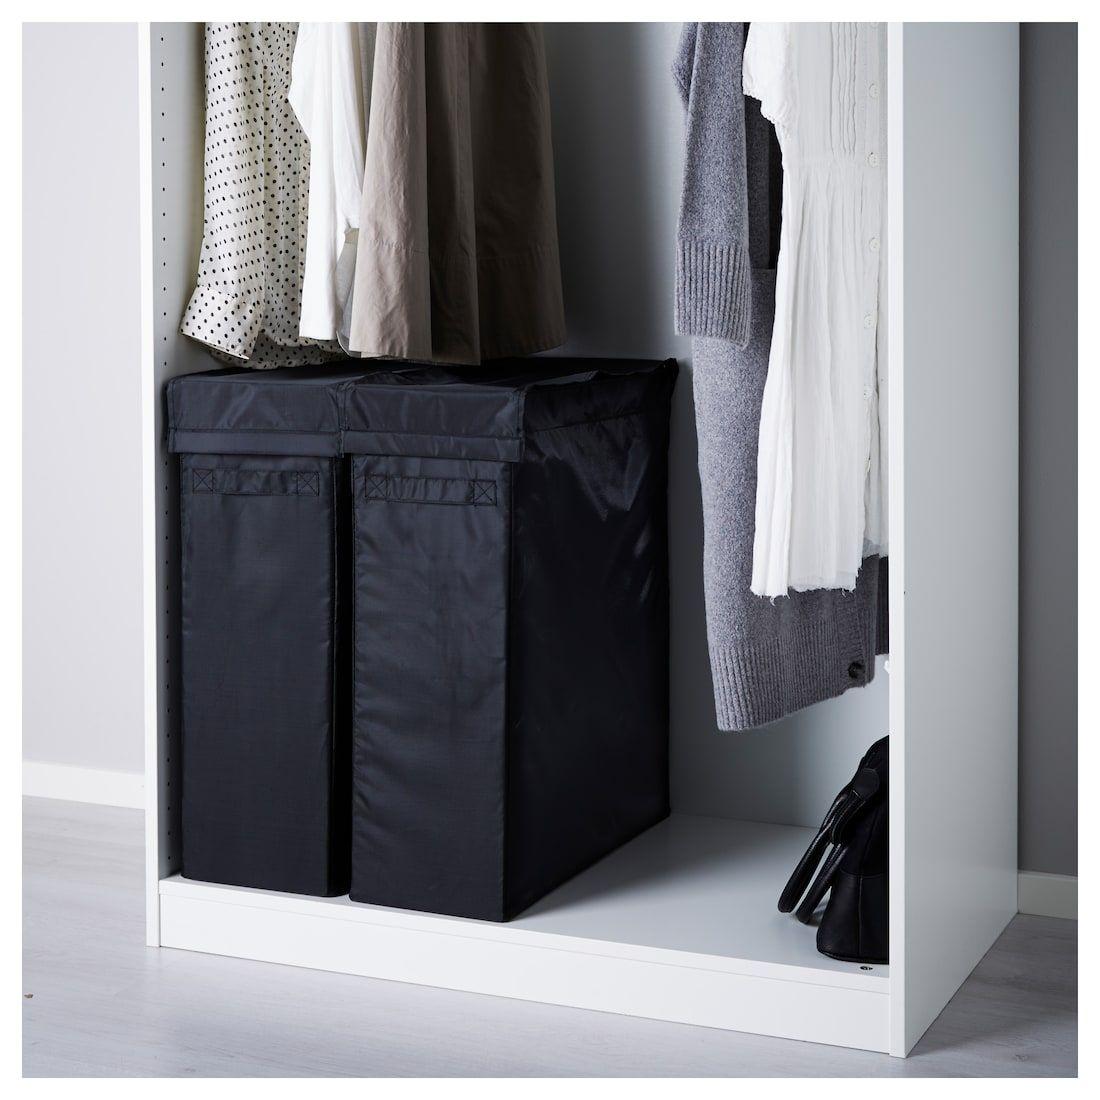 Ikea Skubb Black Laundry Bag With Stand Ikea Ikea Closet